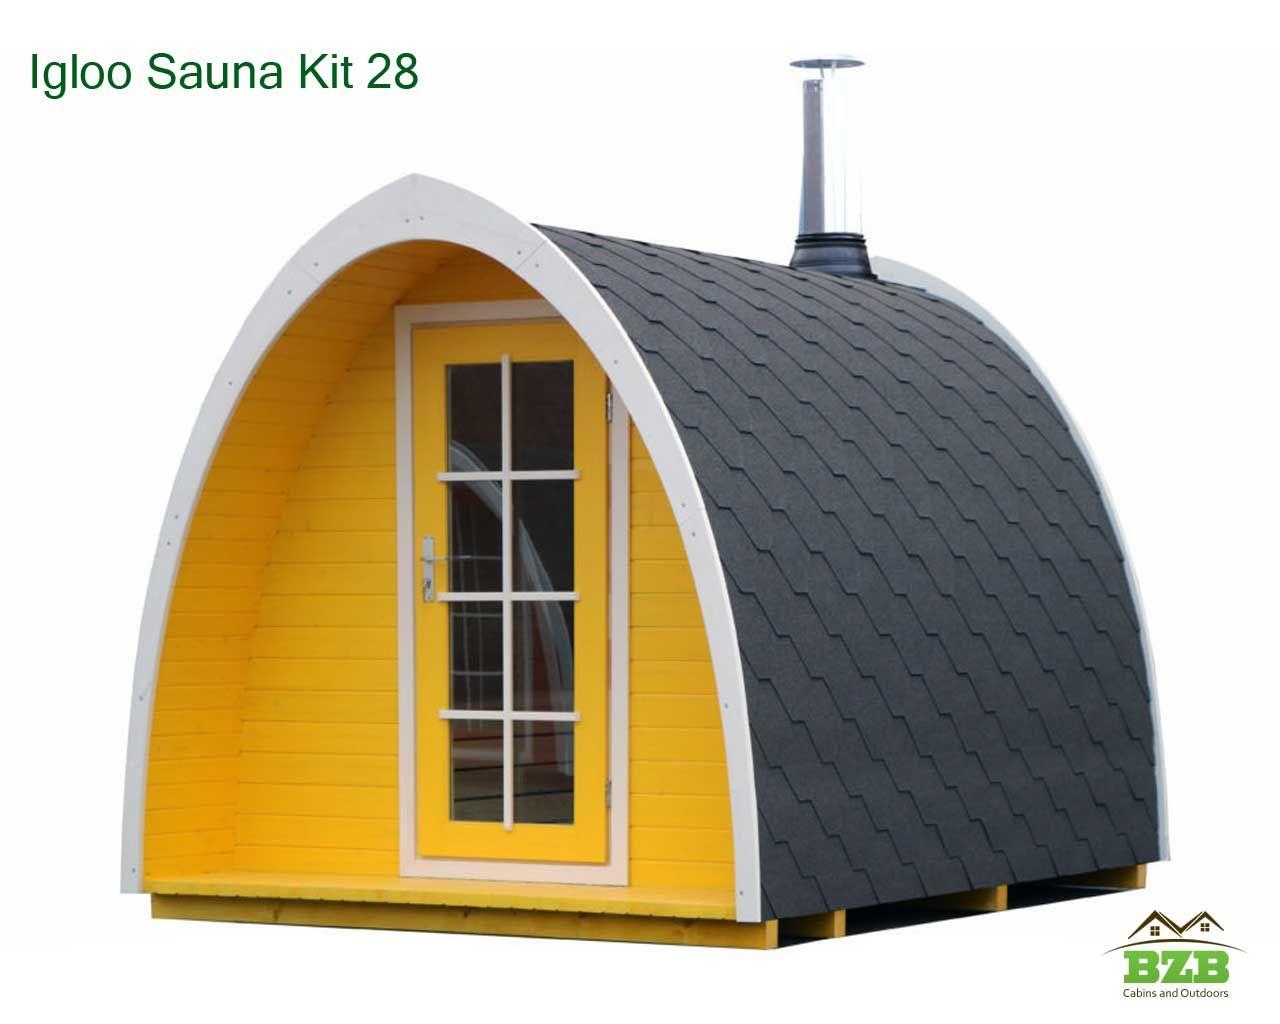 Home Sauna Kits Since 1974 pinterest